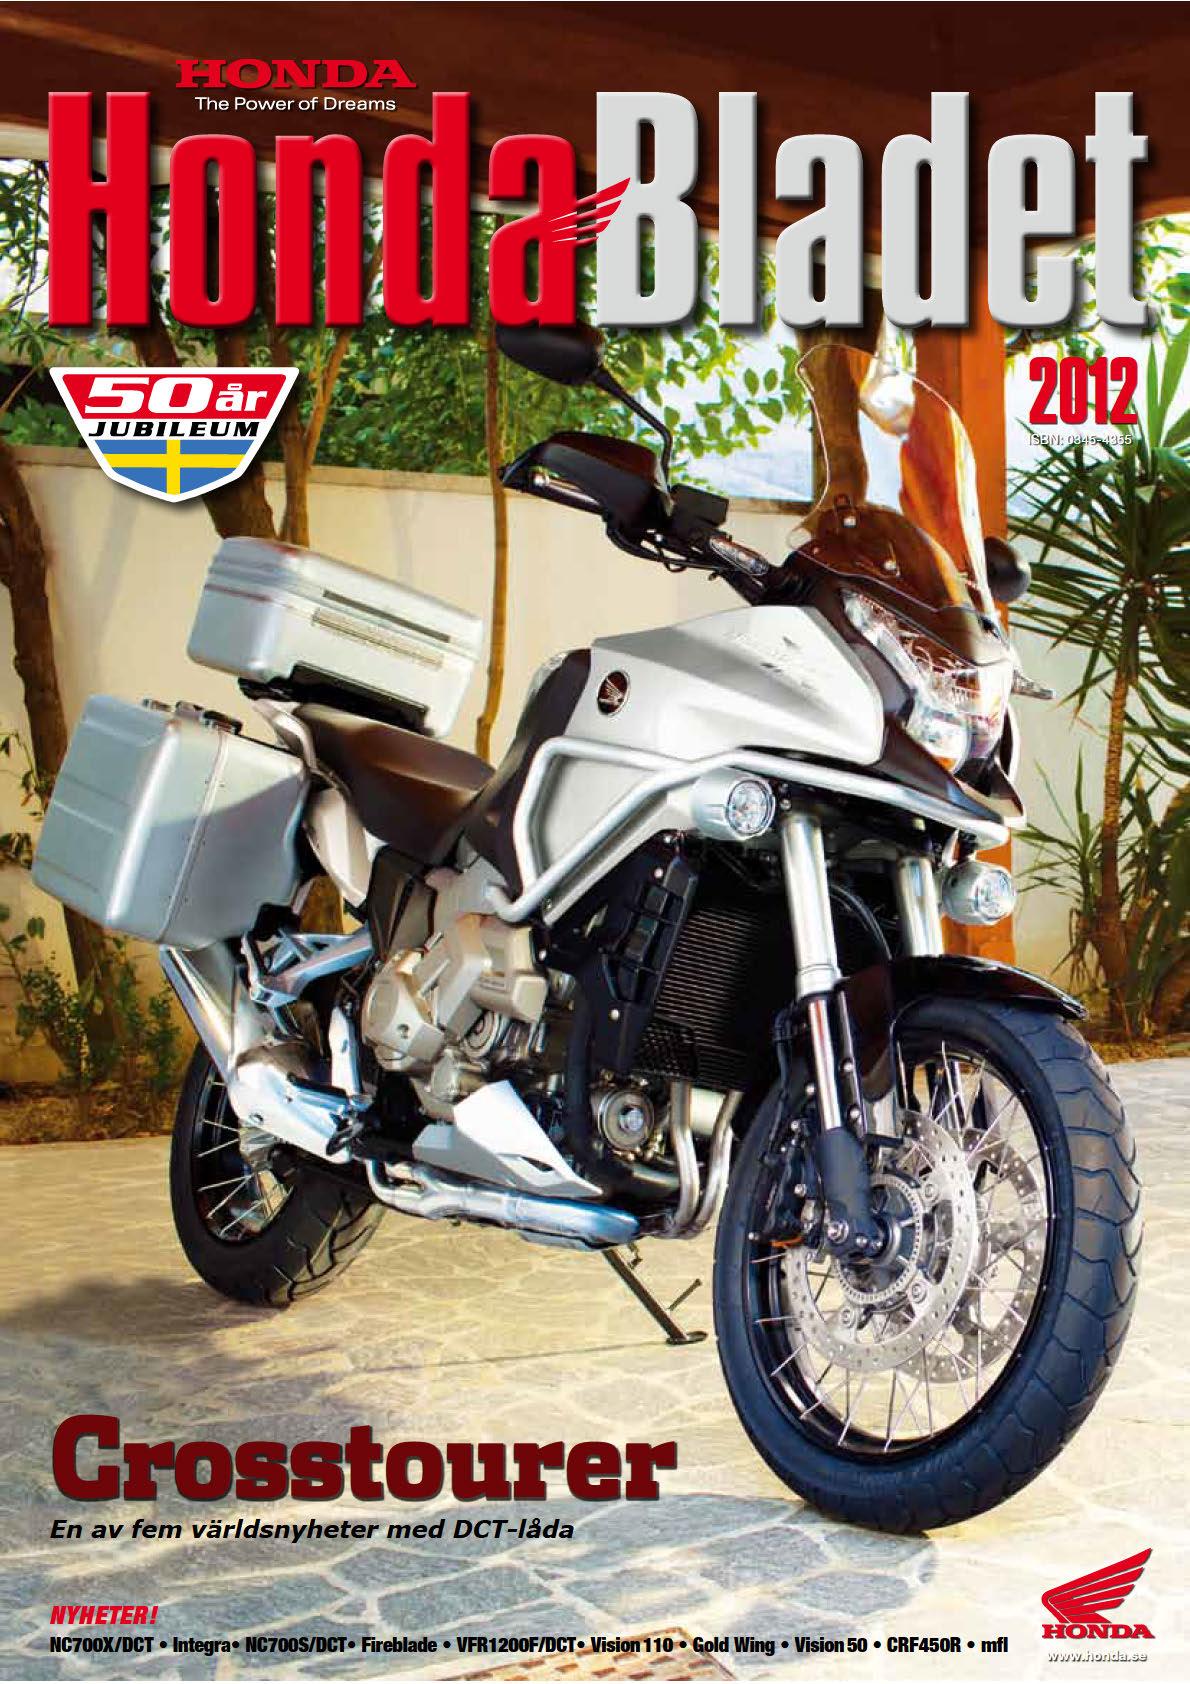 Honda Bladet 2012 - 50th anniversary Sweden